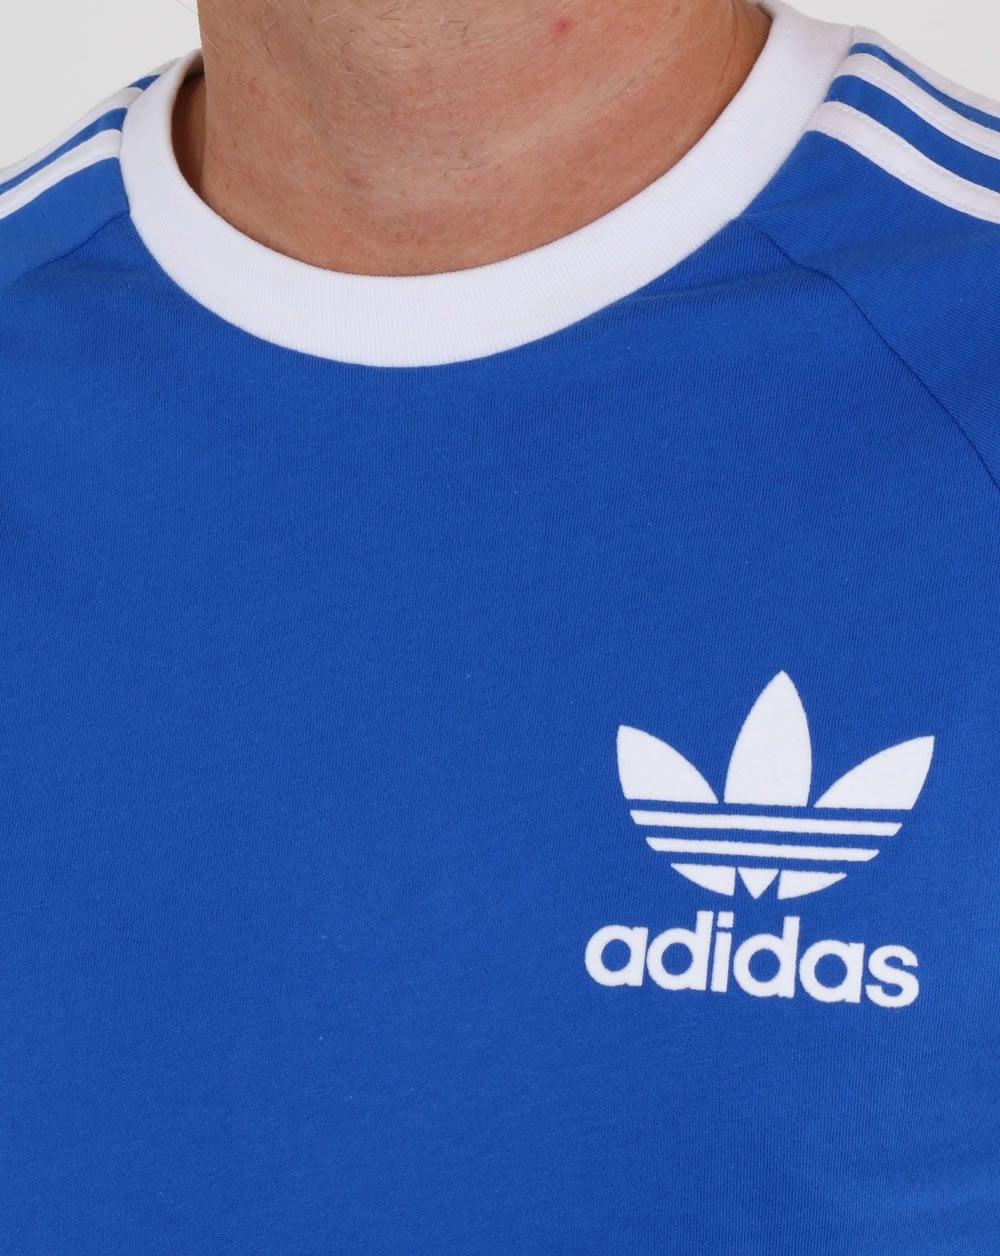 Roblox Adidas T Shirt Blue | AGBU Hye Geen